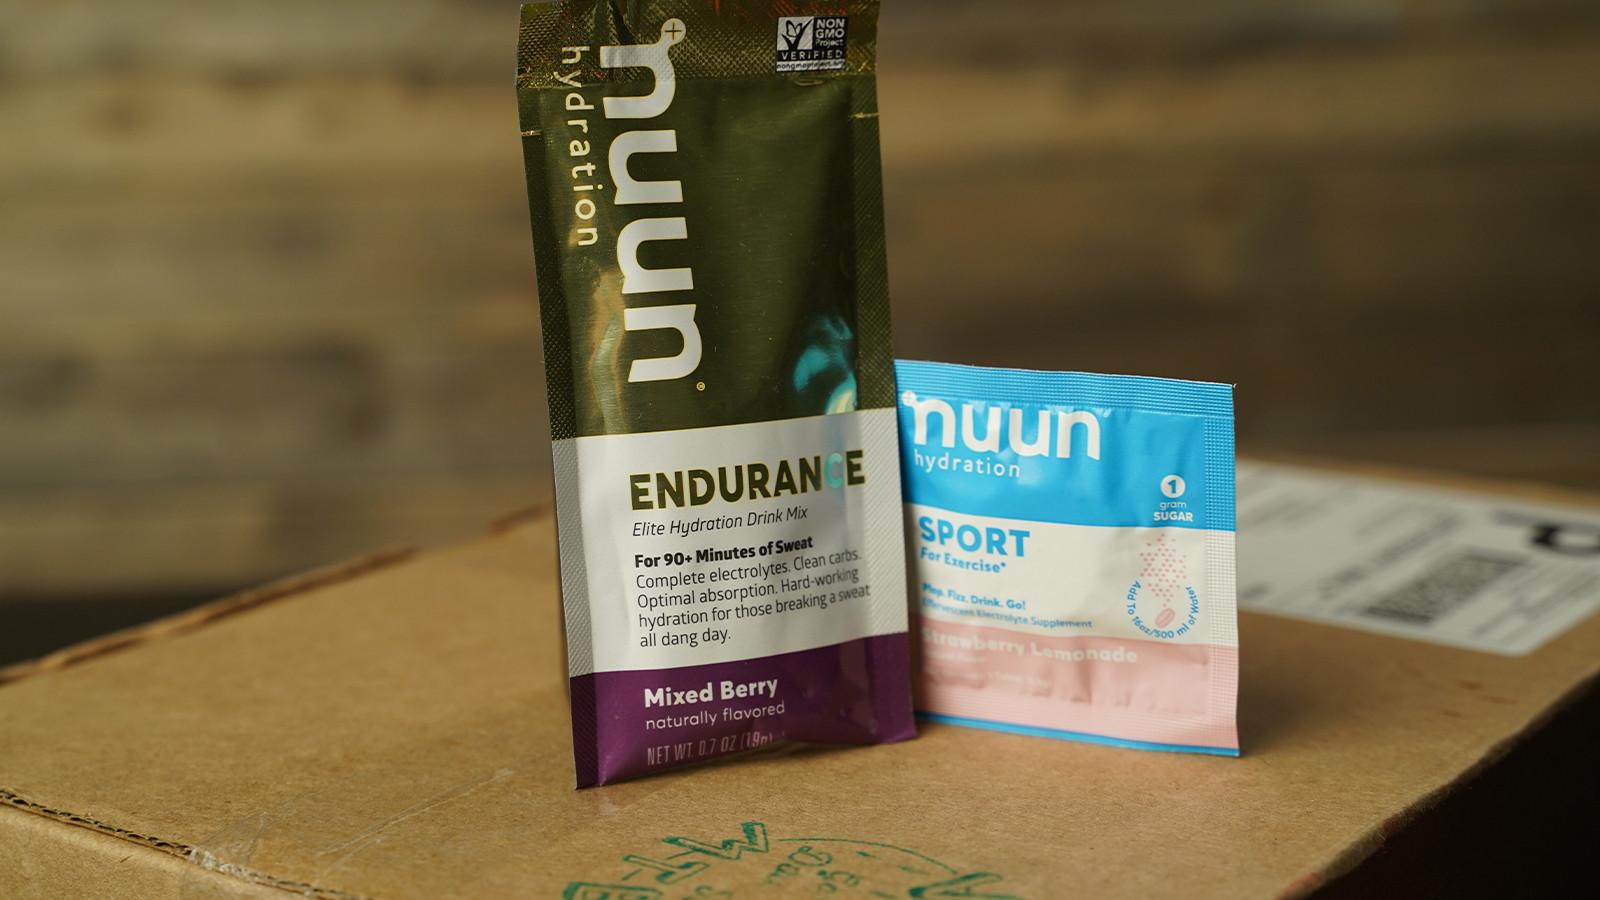 Nuun Hydration Keeps You Riding